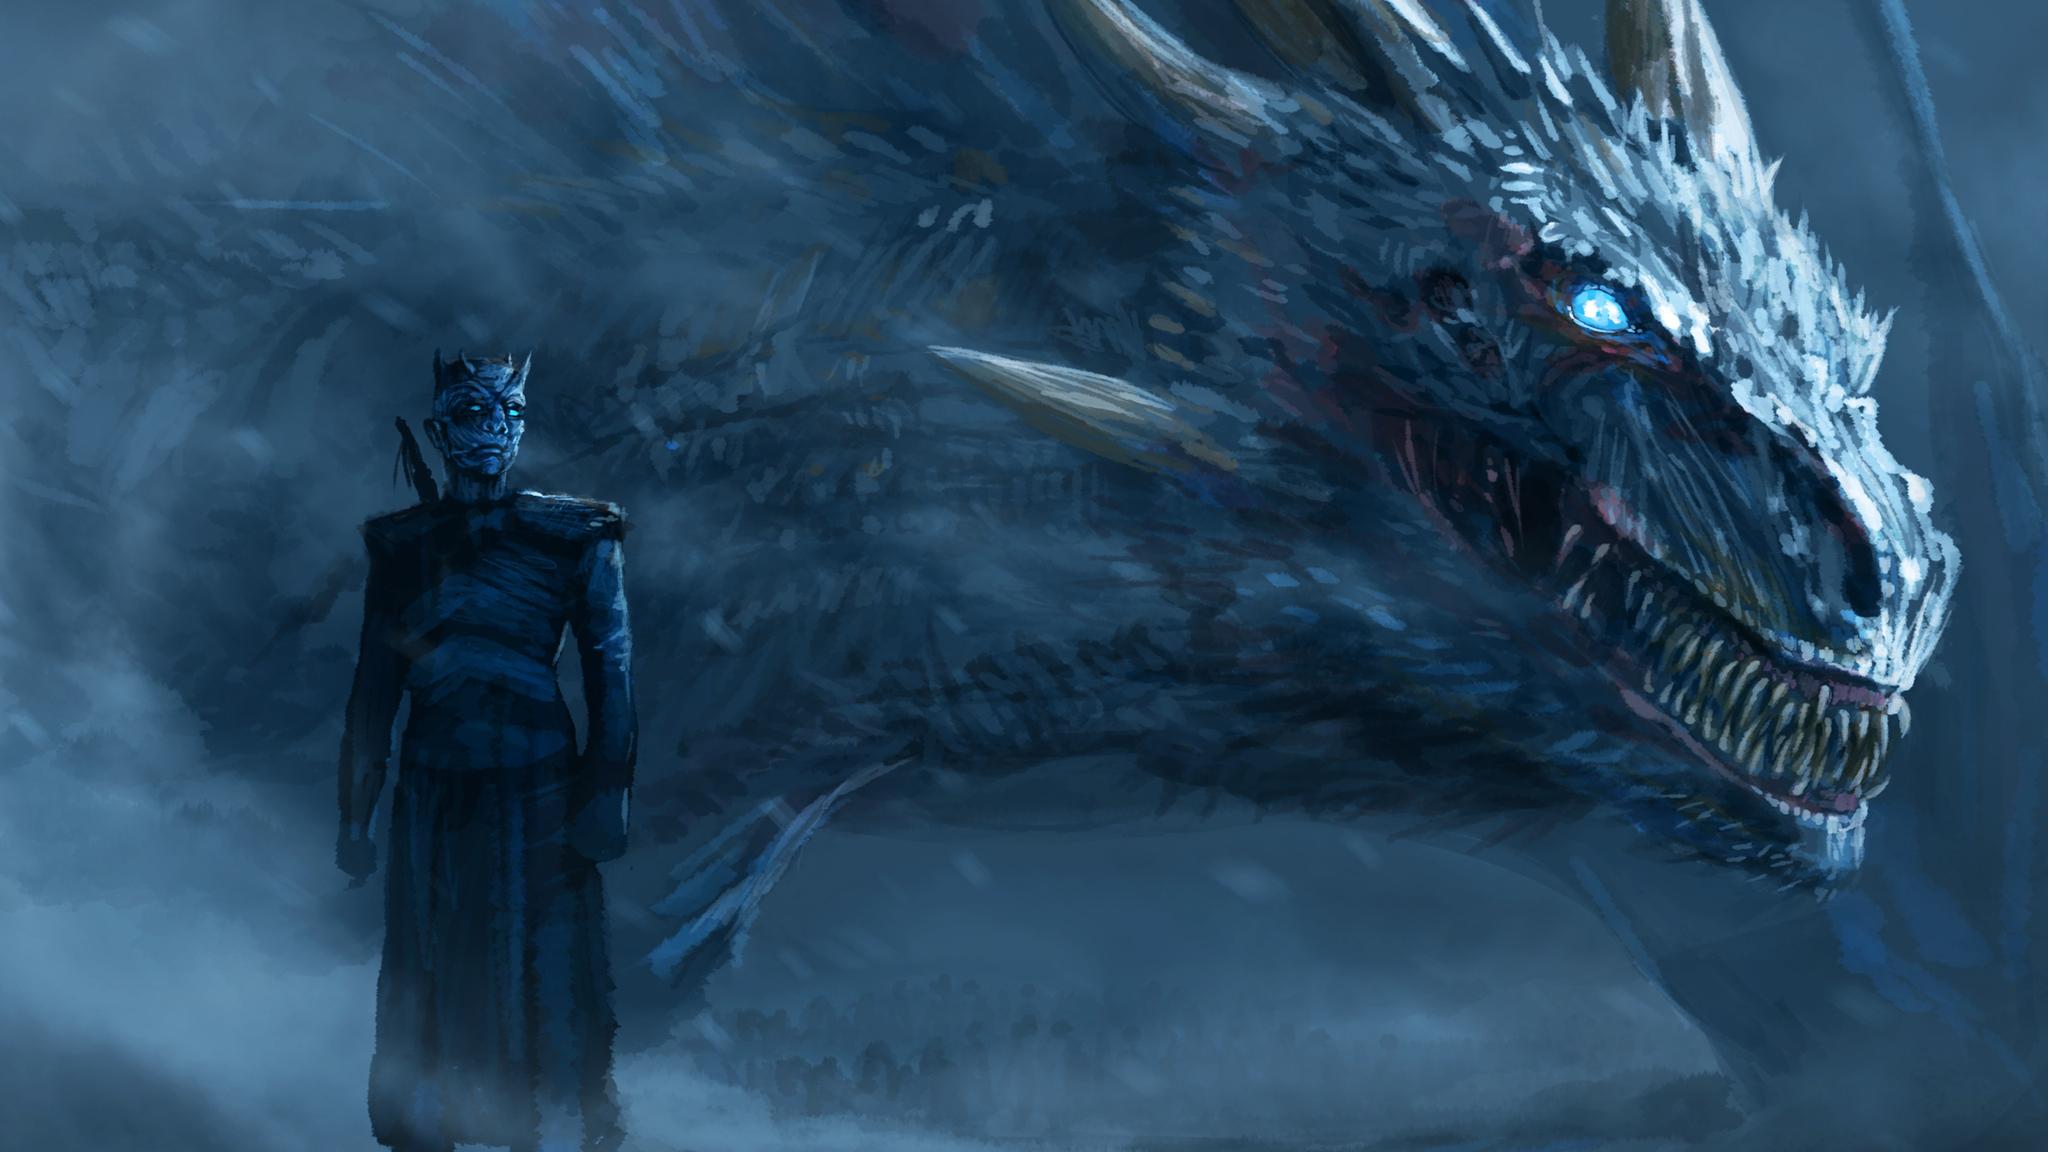 Cool Wallpaper Night Dragon - night-king-blue-eyes-white-dragon-6b-2048x1152  Trends.jpg